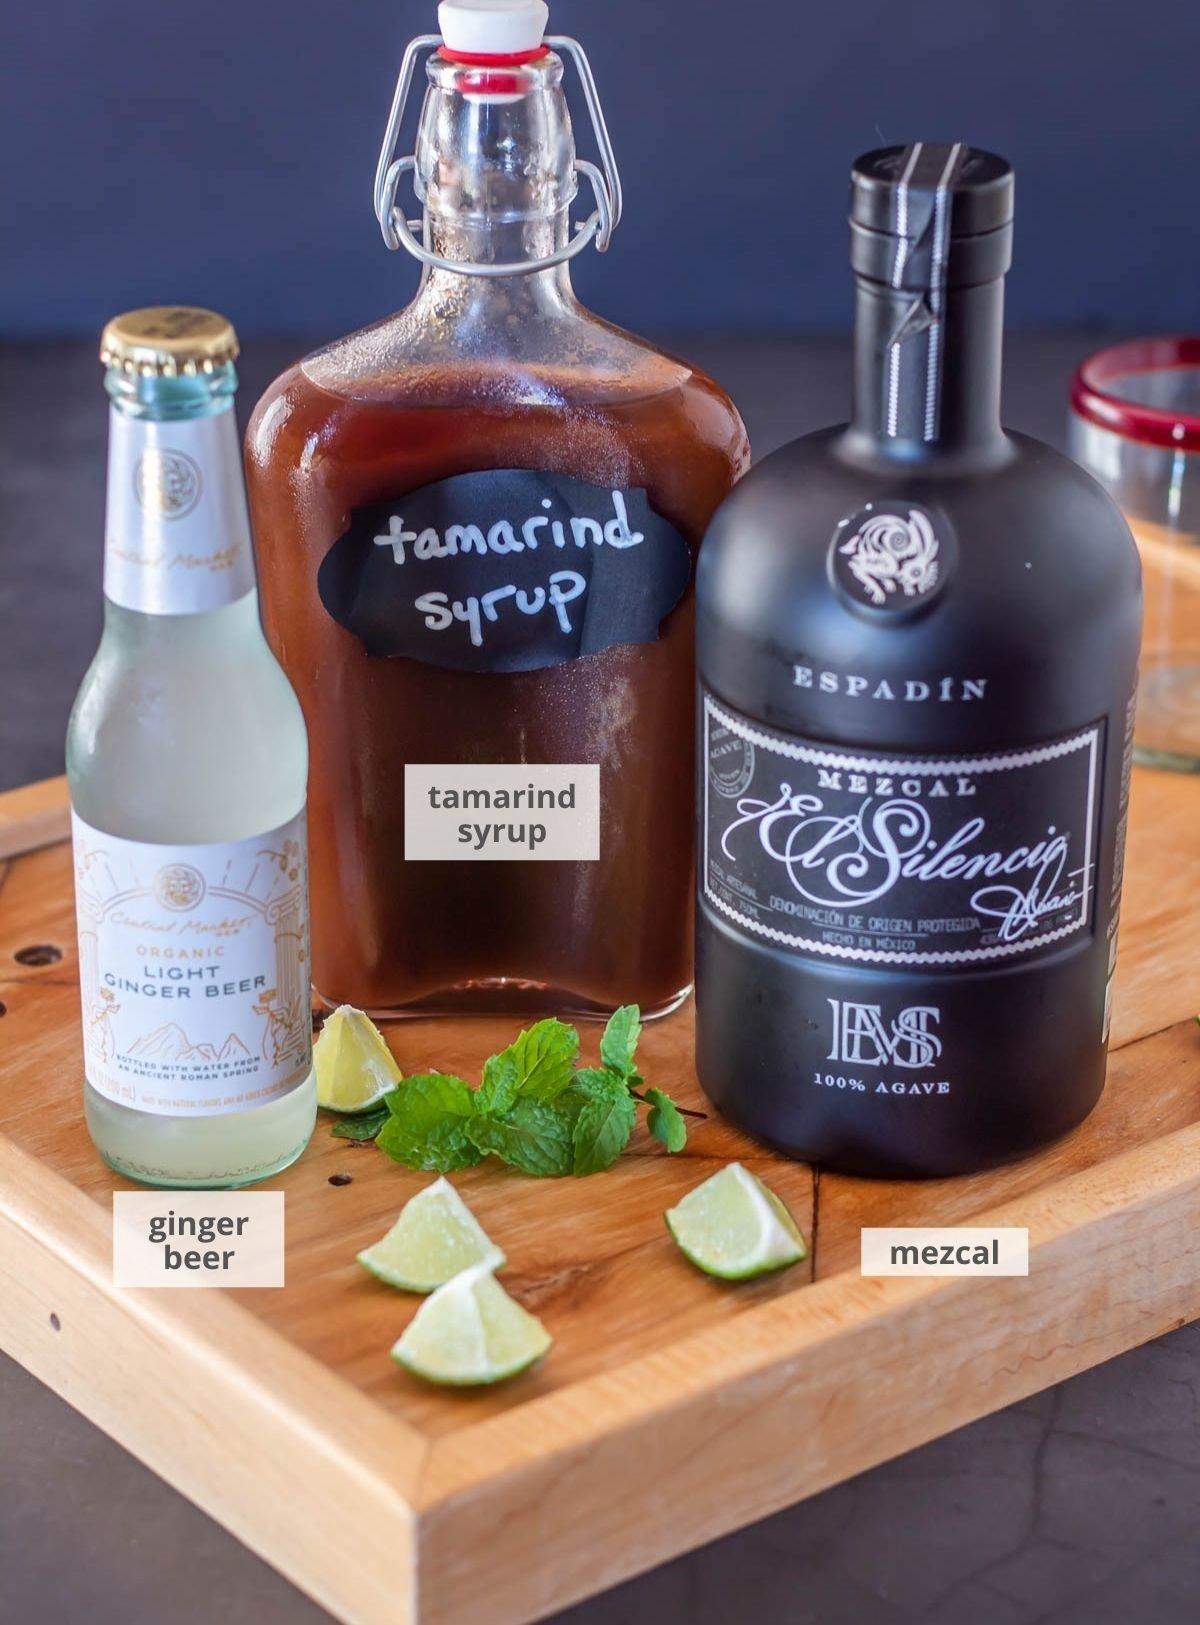 Ingredients for the tamarind mezcal mule: Ginger beer, tamarind syrup, mezcal, with lime and mint garnish.